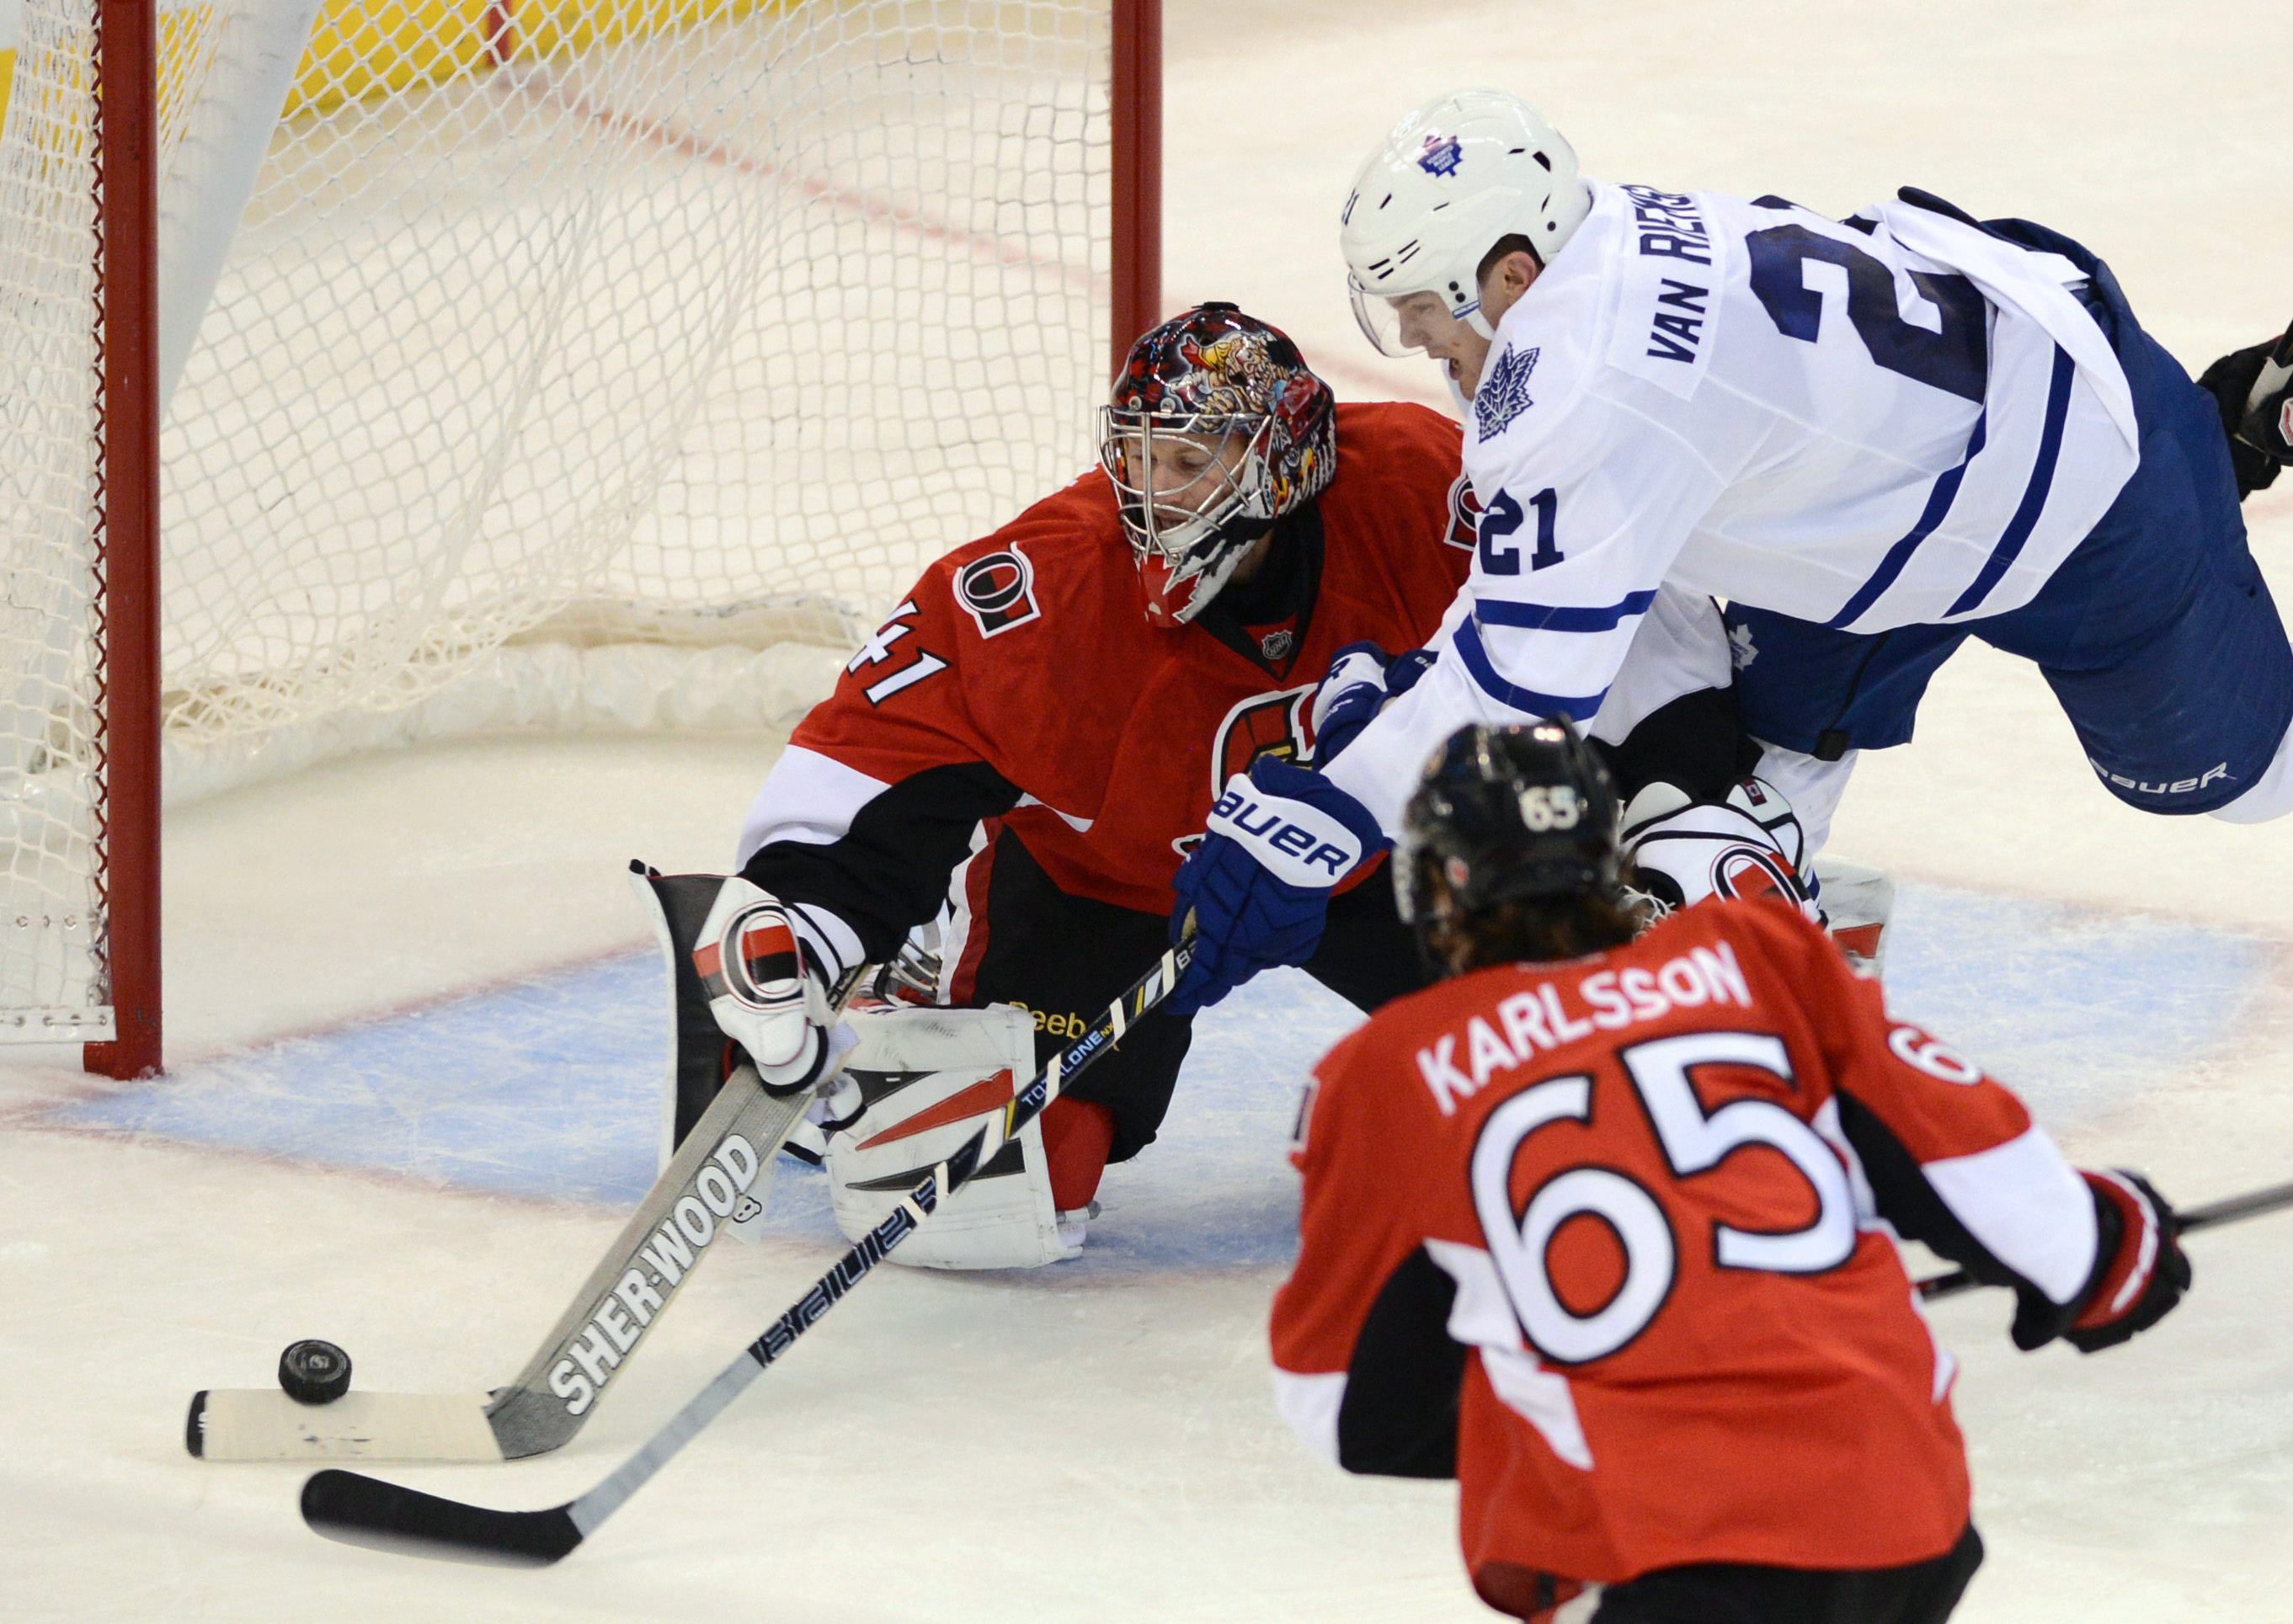 Bolland lifts Maple Leafs past Senators 3-2